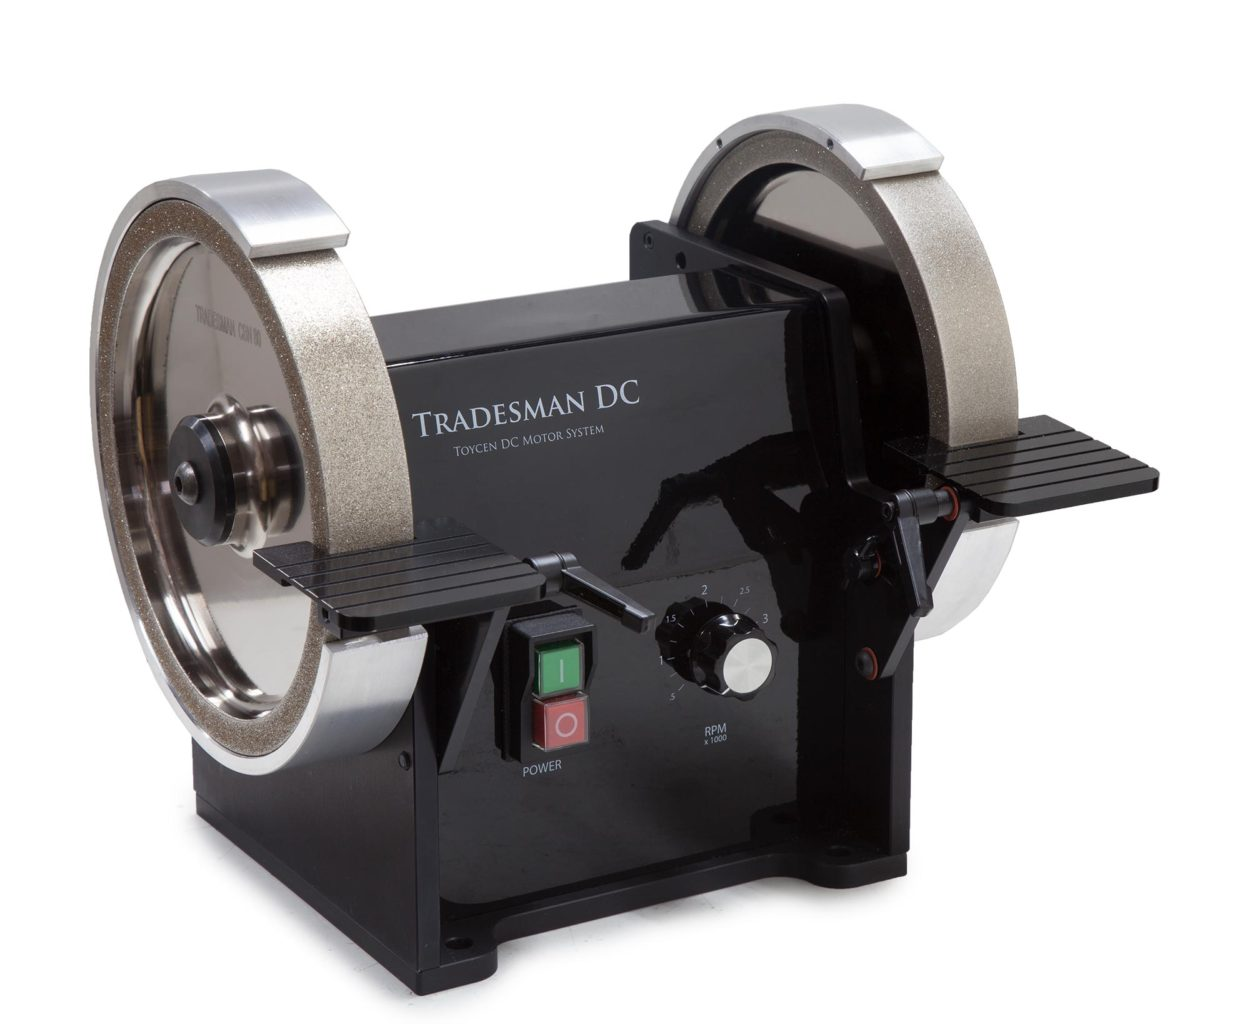 Tradesman Machinist 8 Inch Dc Precision Bench Grinder